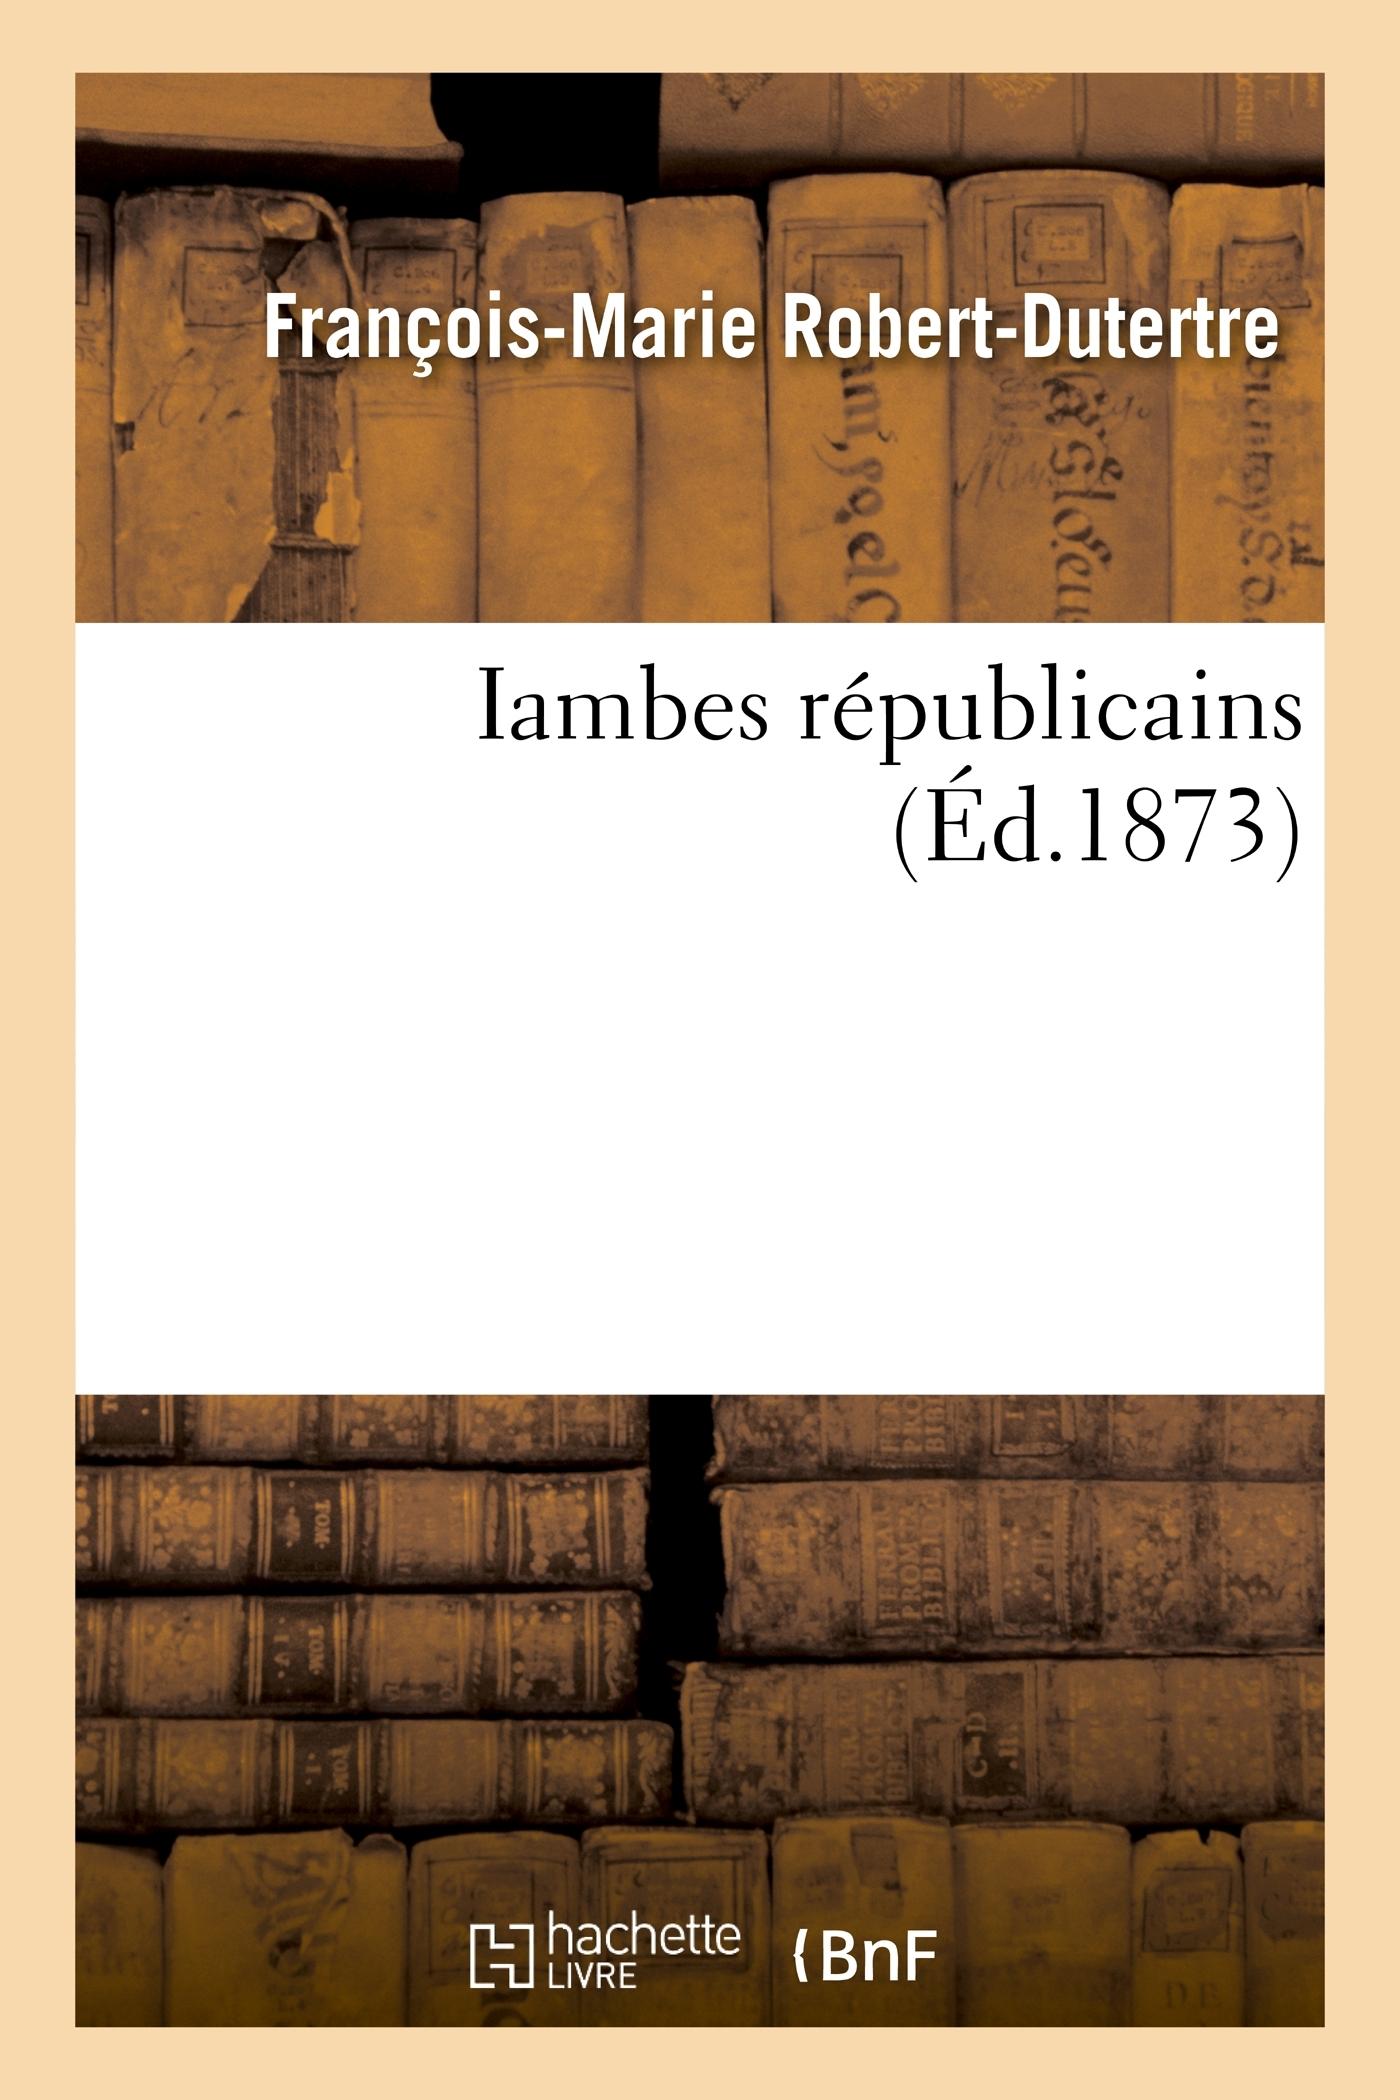 IAMBES REPUBLICAINS